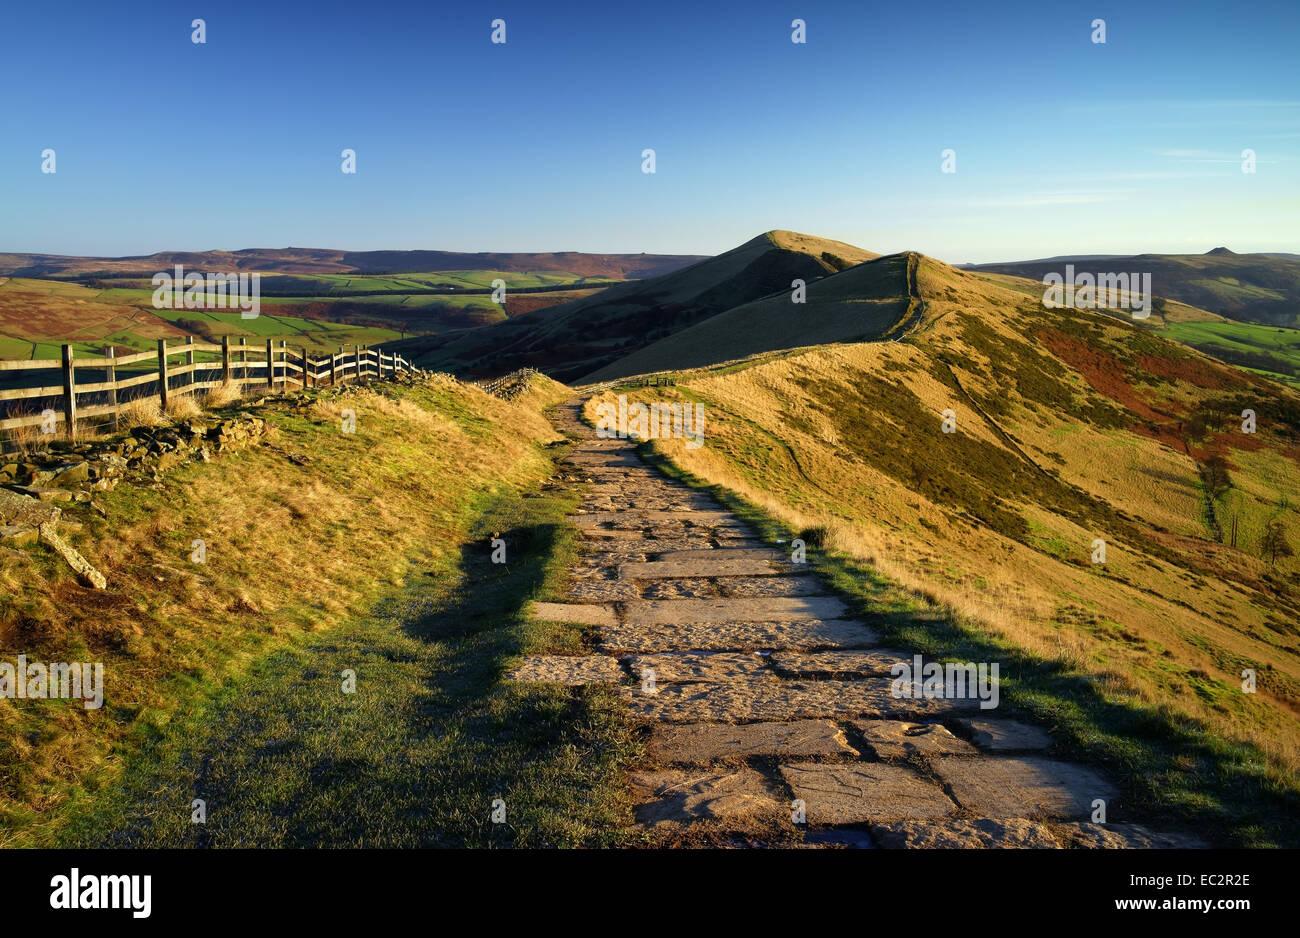 UK,Derbyshire,Peak District,Footpath along The Great Ridge - Stock Image